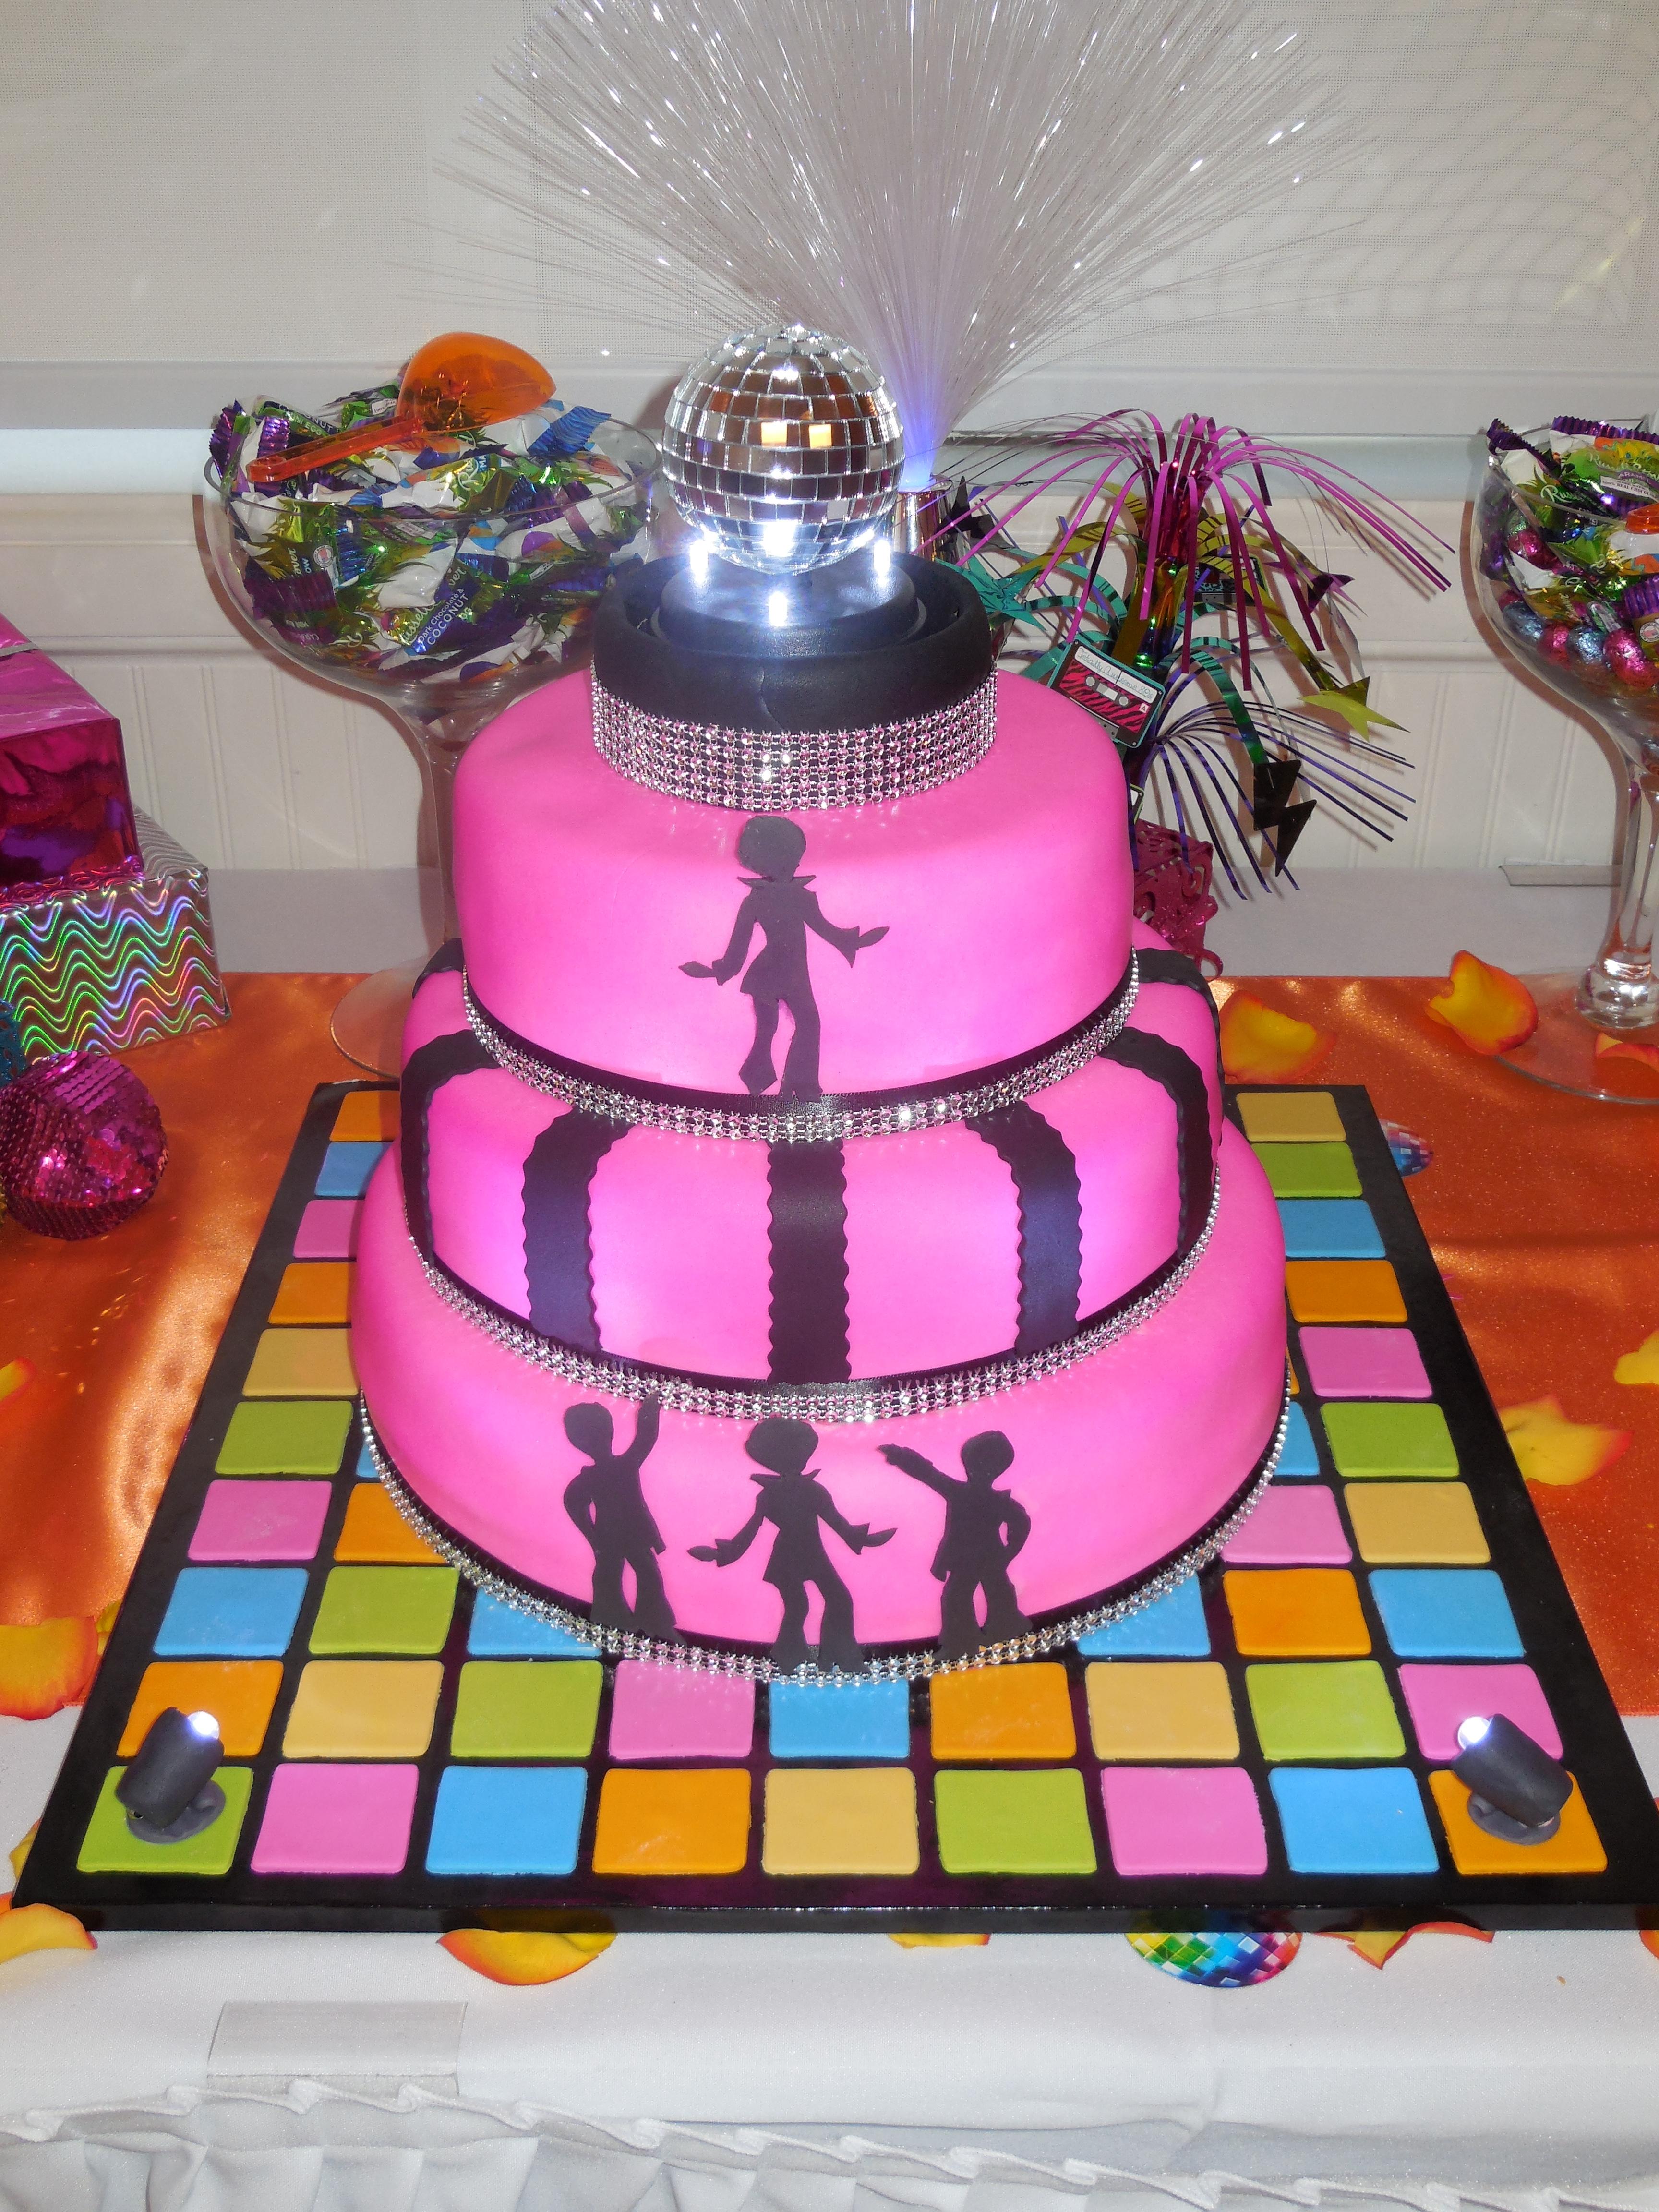 Disco Party Cake Images : 70 s Disco Party Cake - CakeCentral.com